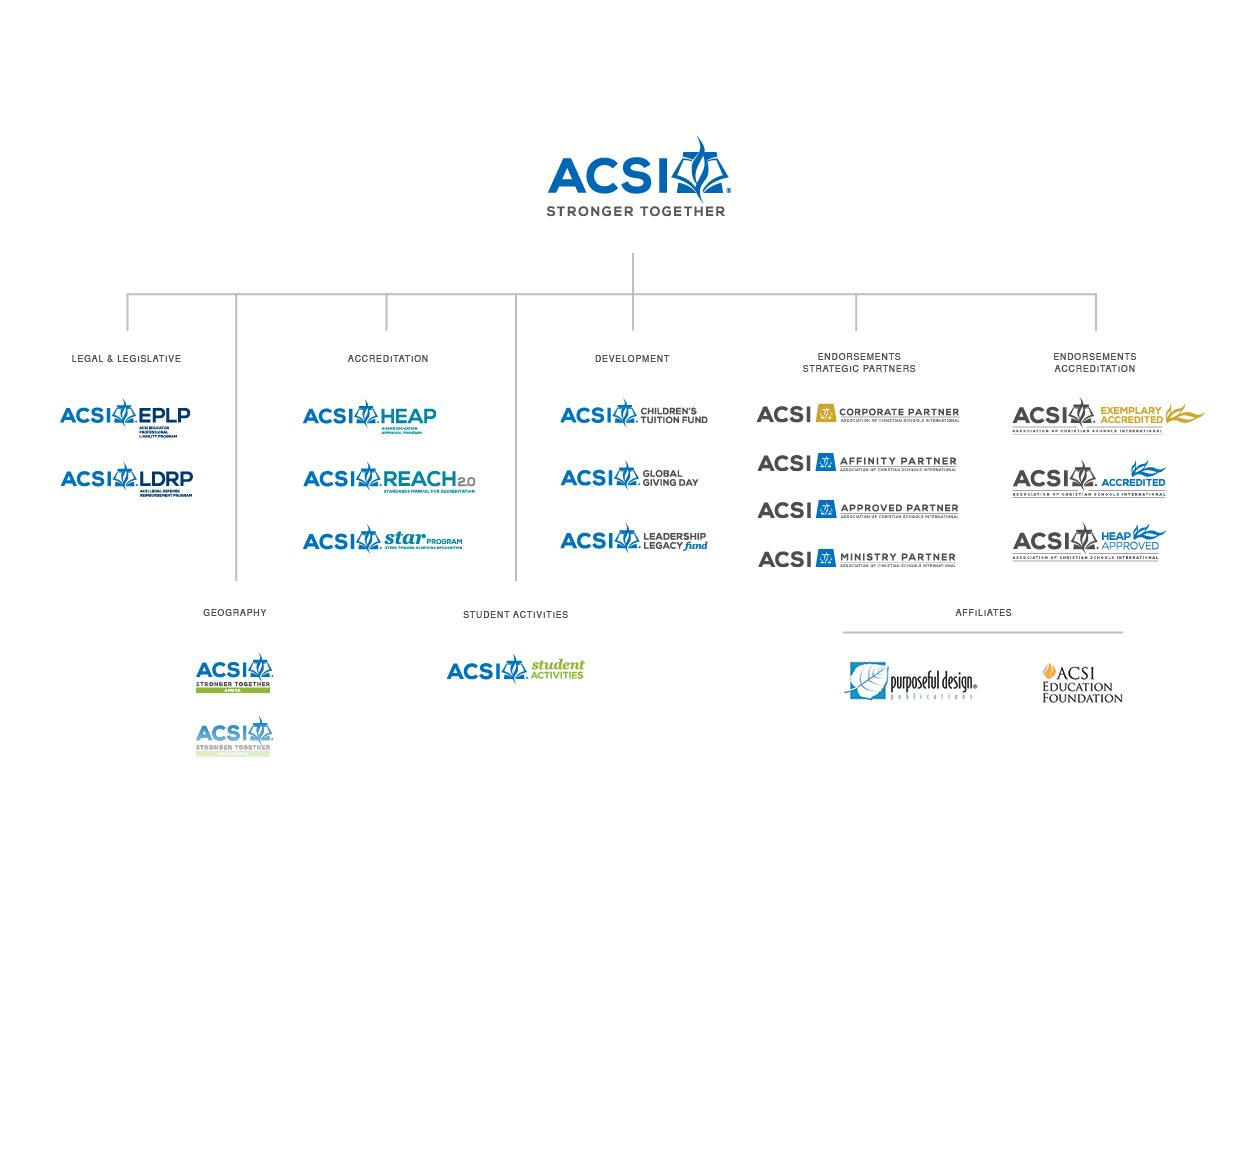 CaseStudy_ACSI19.jpg